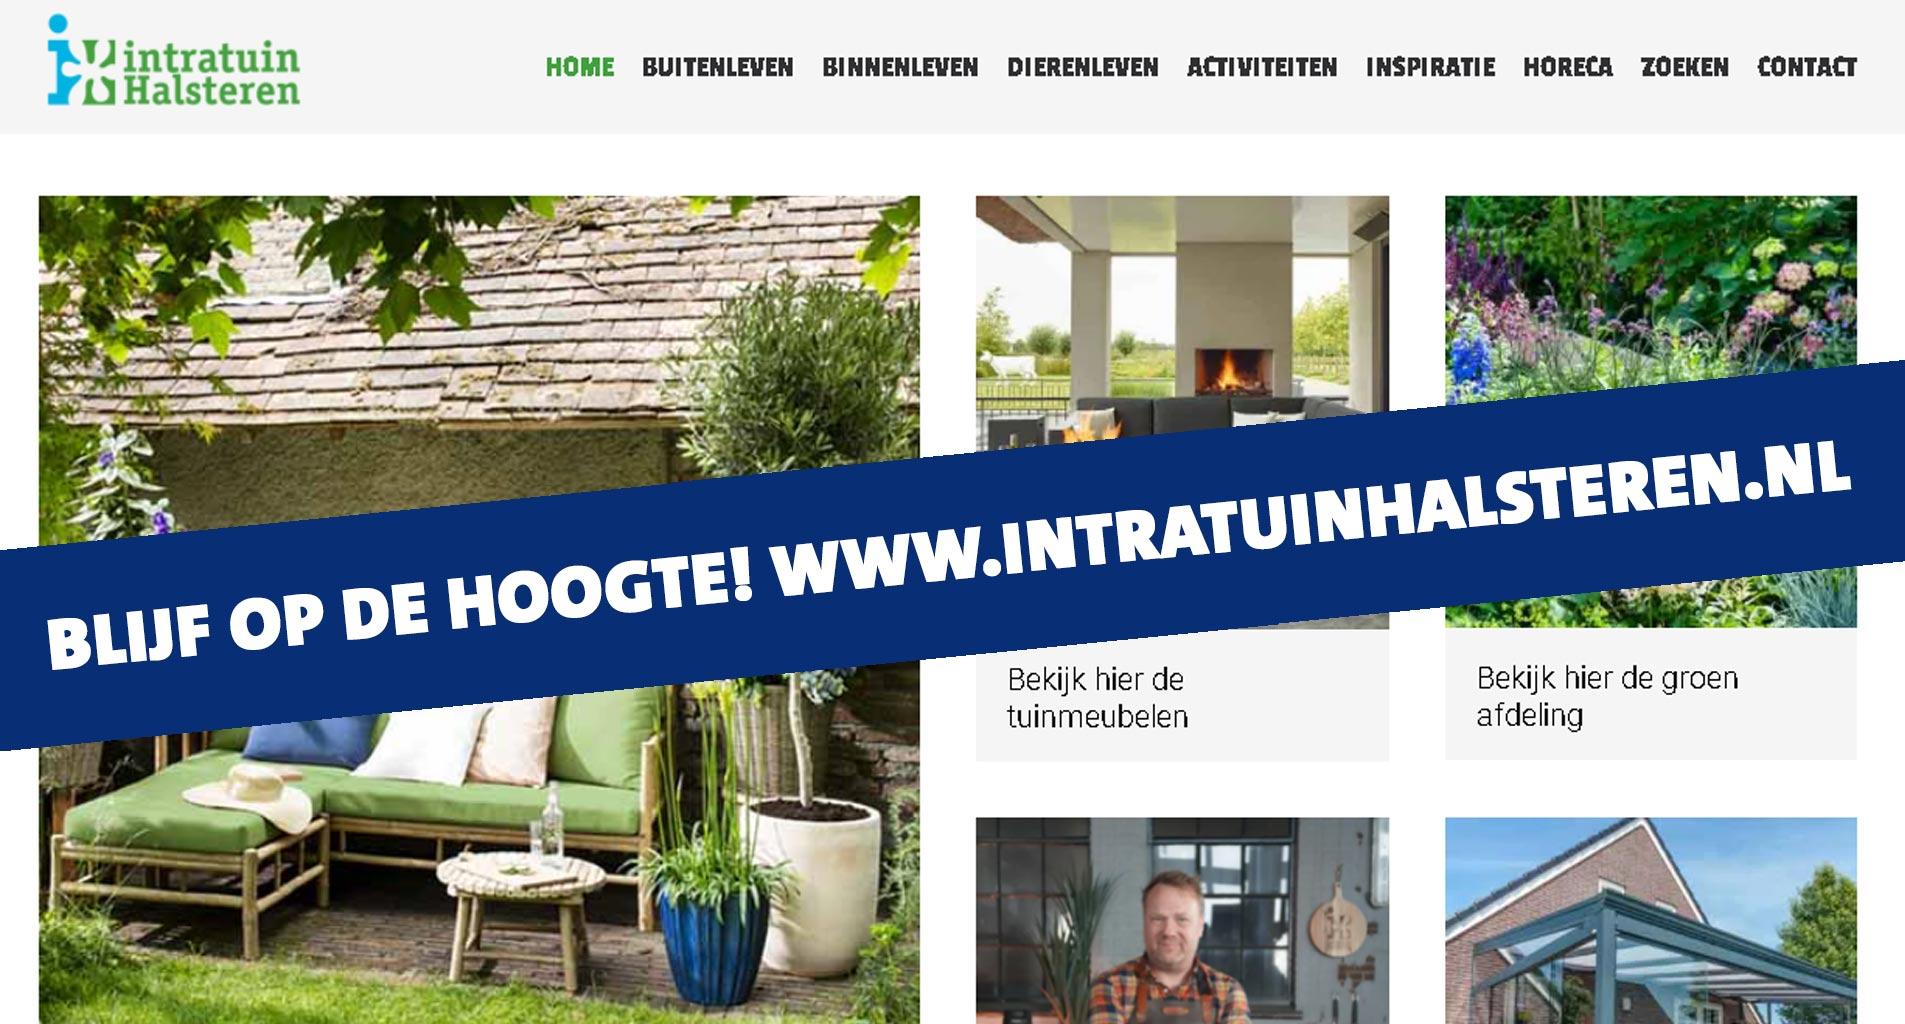 WWW.INTRATUINHALSTEREN.NL